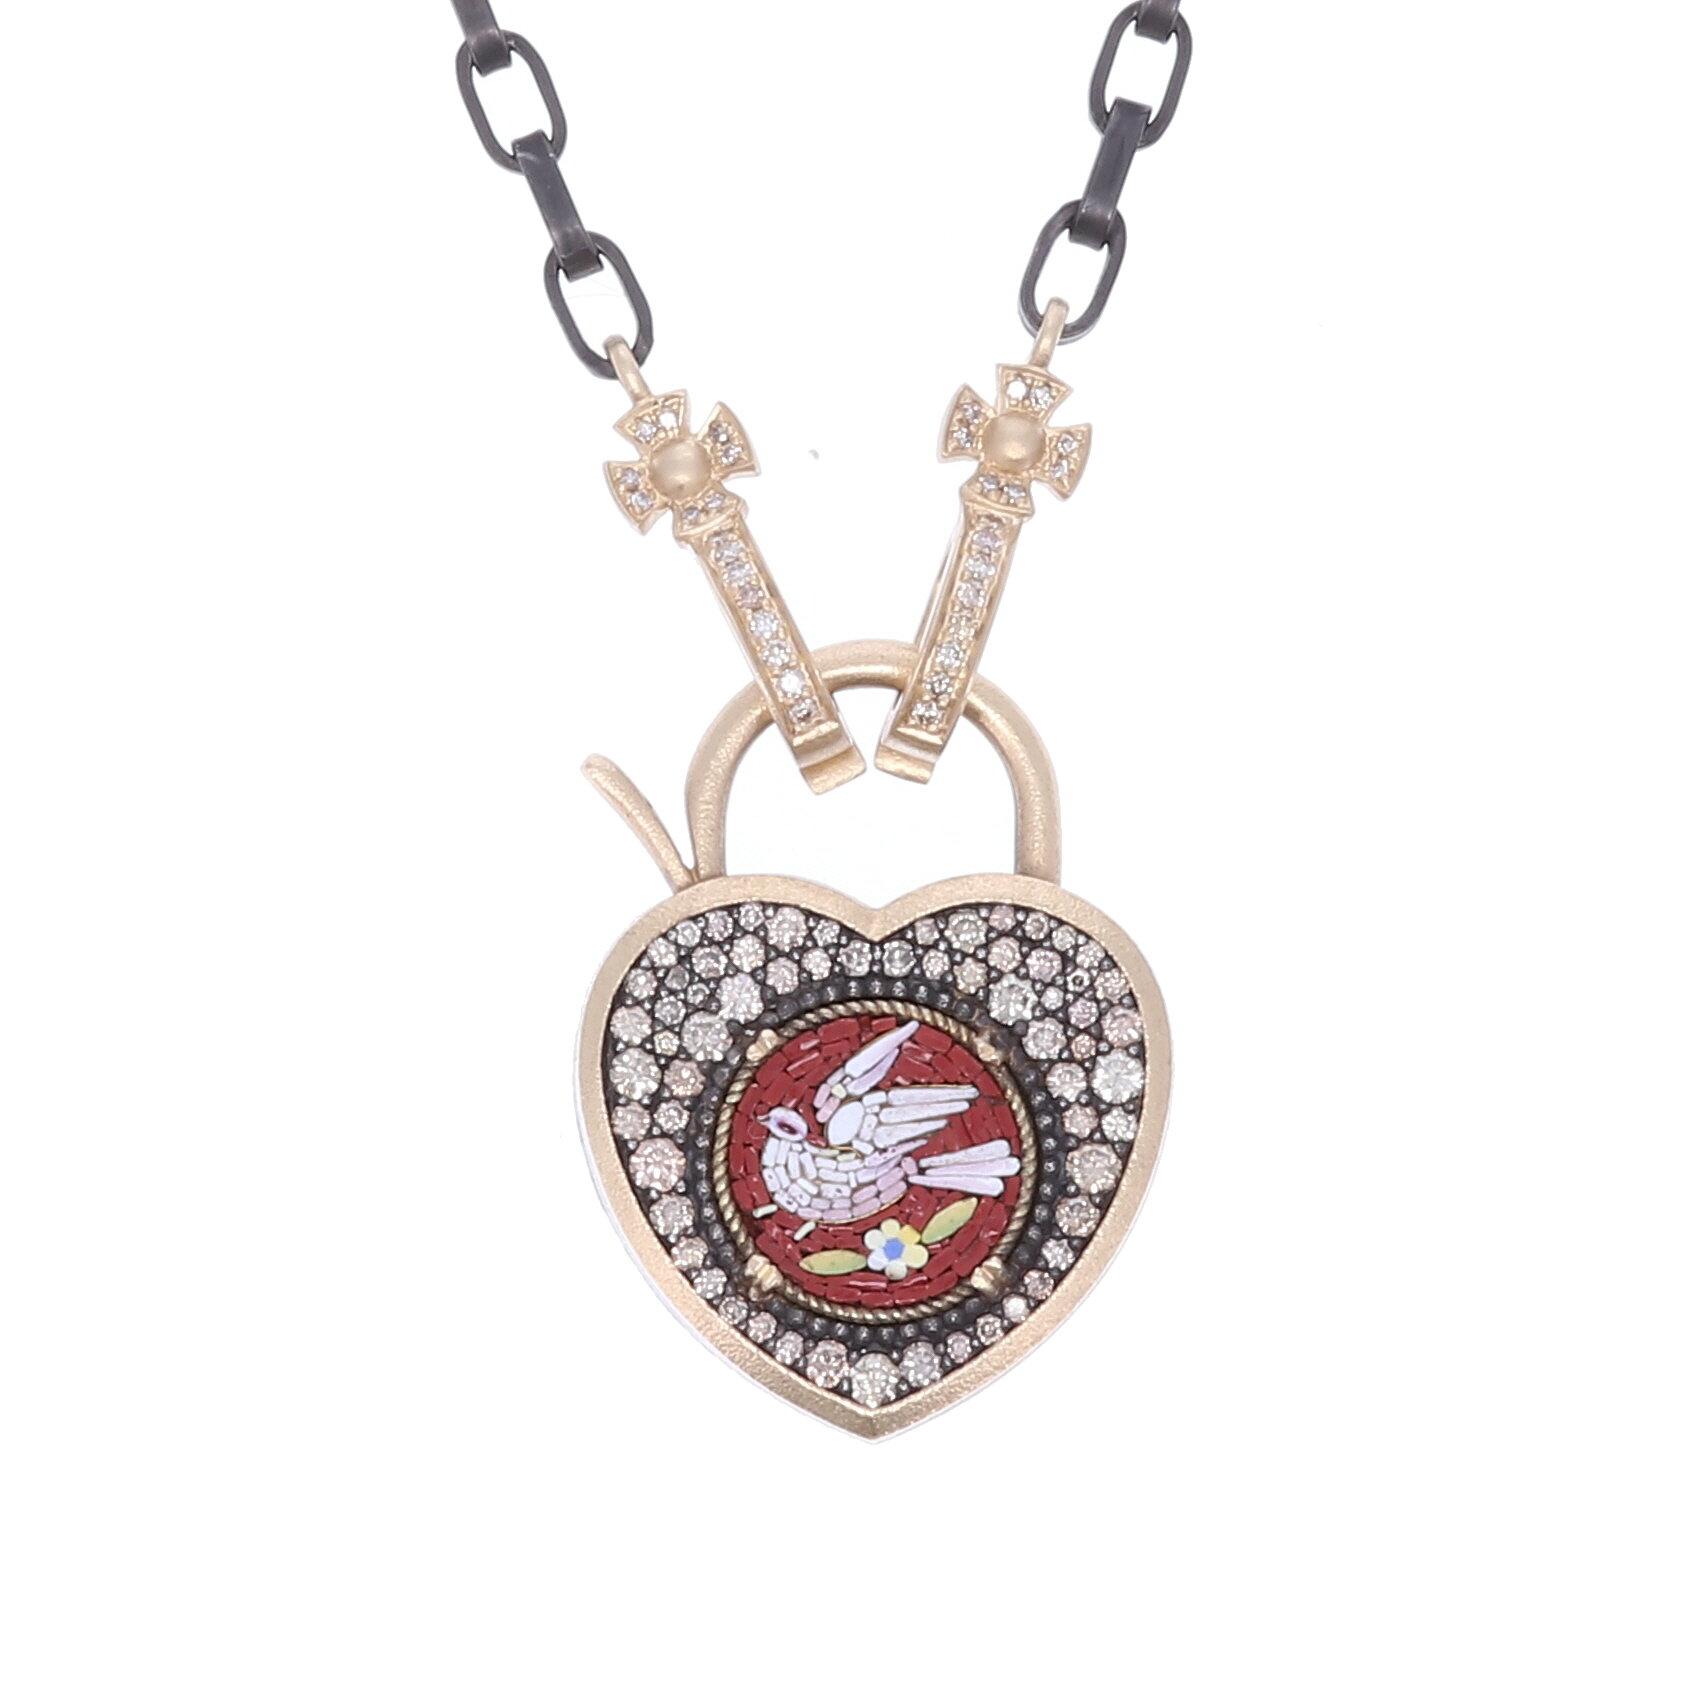 Rose Cut Diamond Cross Pendant, along with a Classic Heart Diamond Pendant and a Madonna